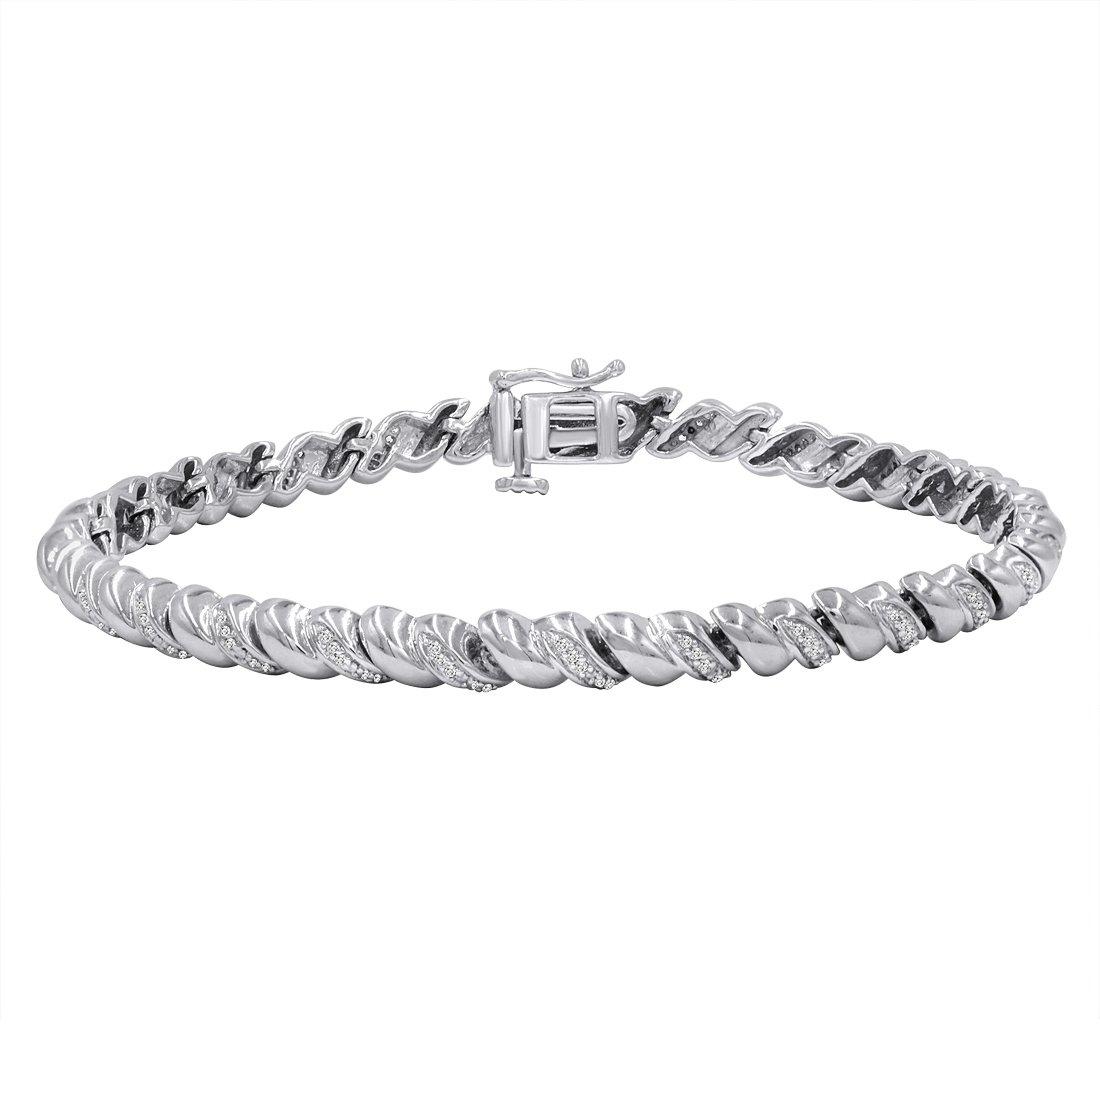 AGS Certified 1/3ct TW Diamond San Marco Tennis Bracelet in Sterling Silver